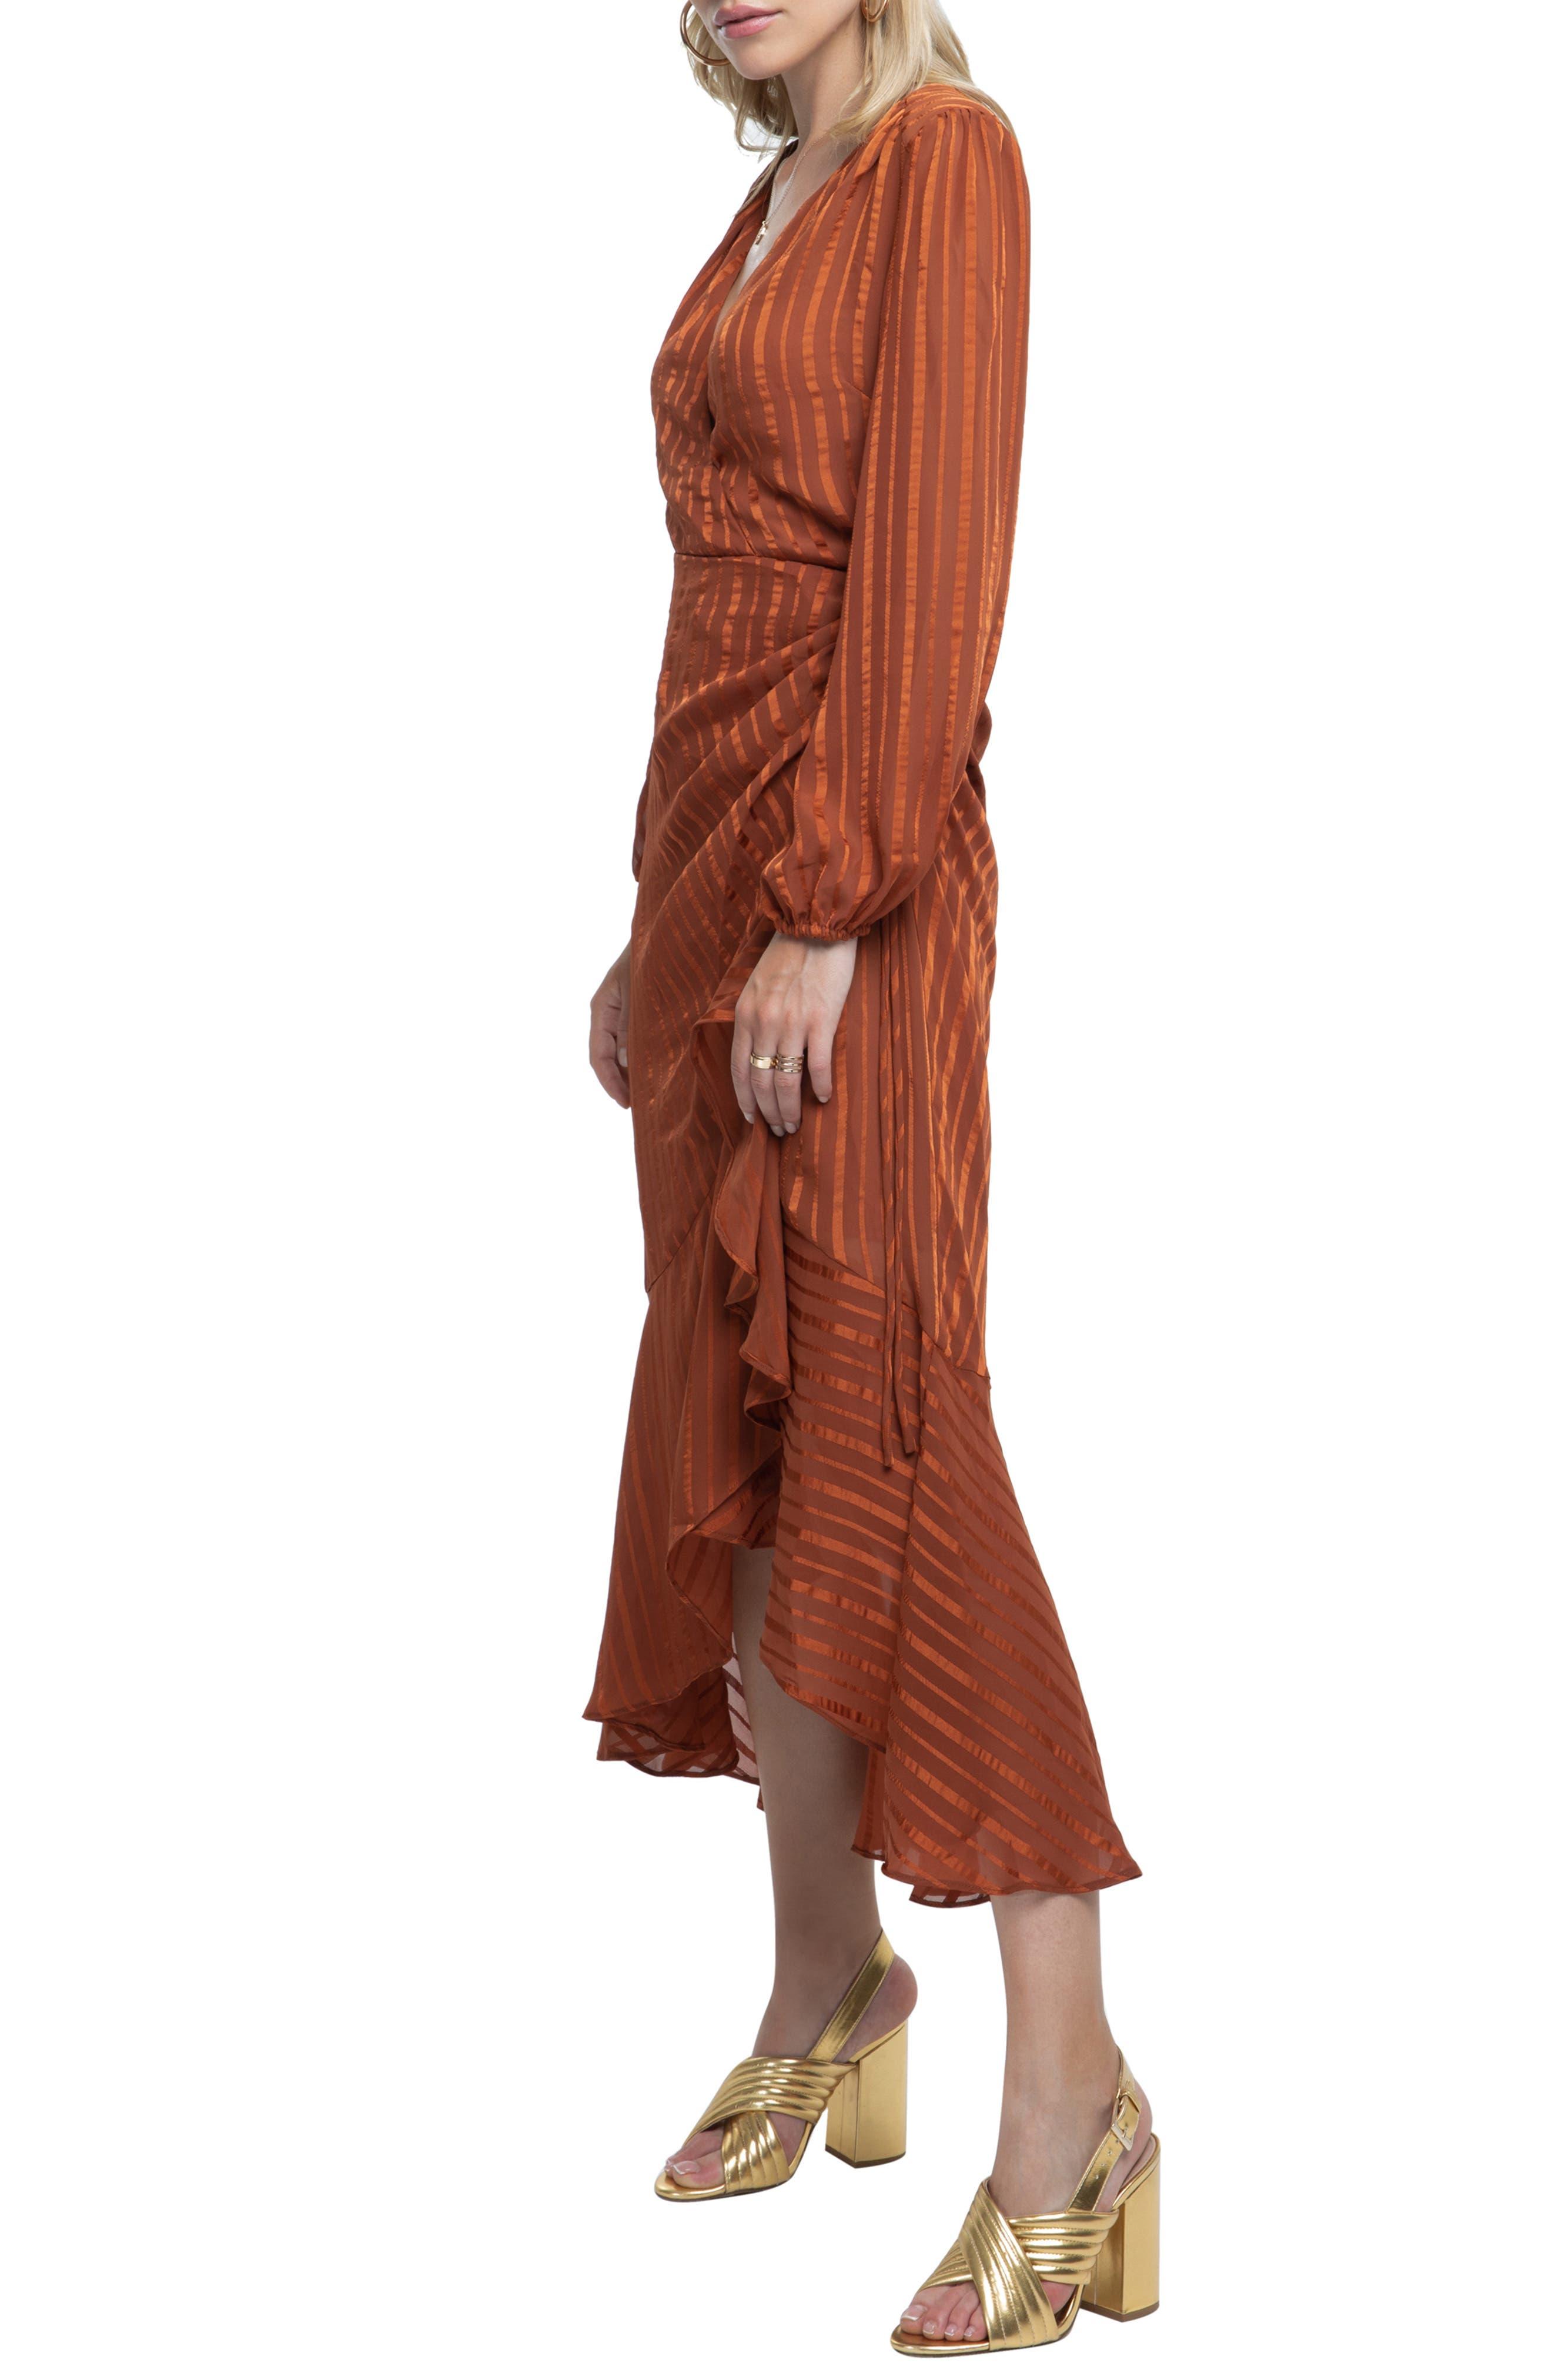 ASTR THE LABEL, Side Cinched Ruffle Hem Dress, Alternate thumbnail 3, color, 200